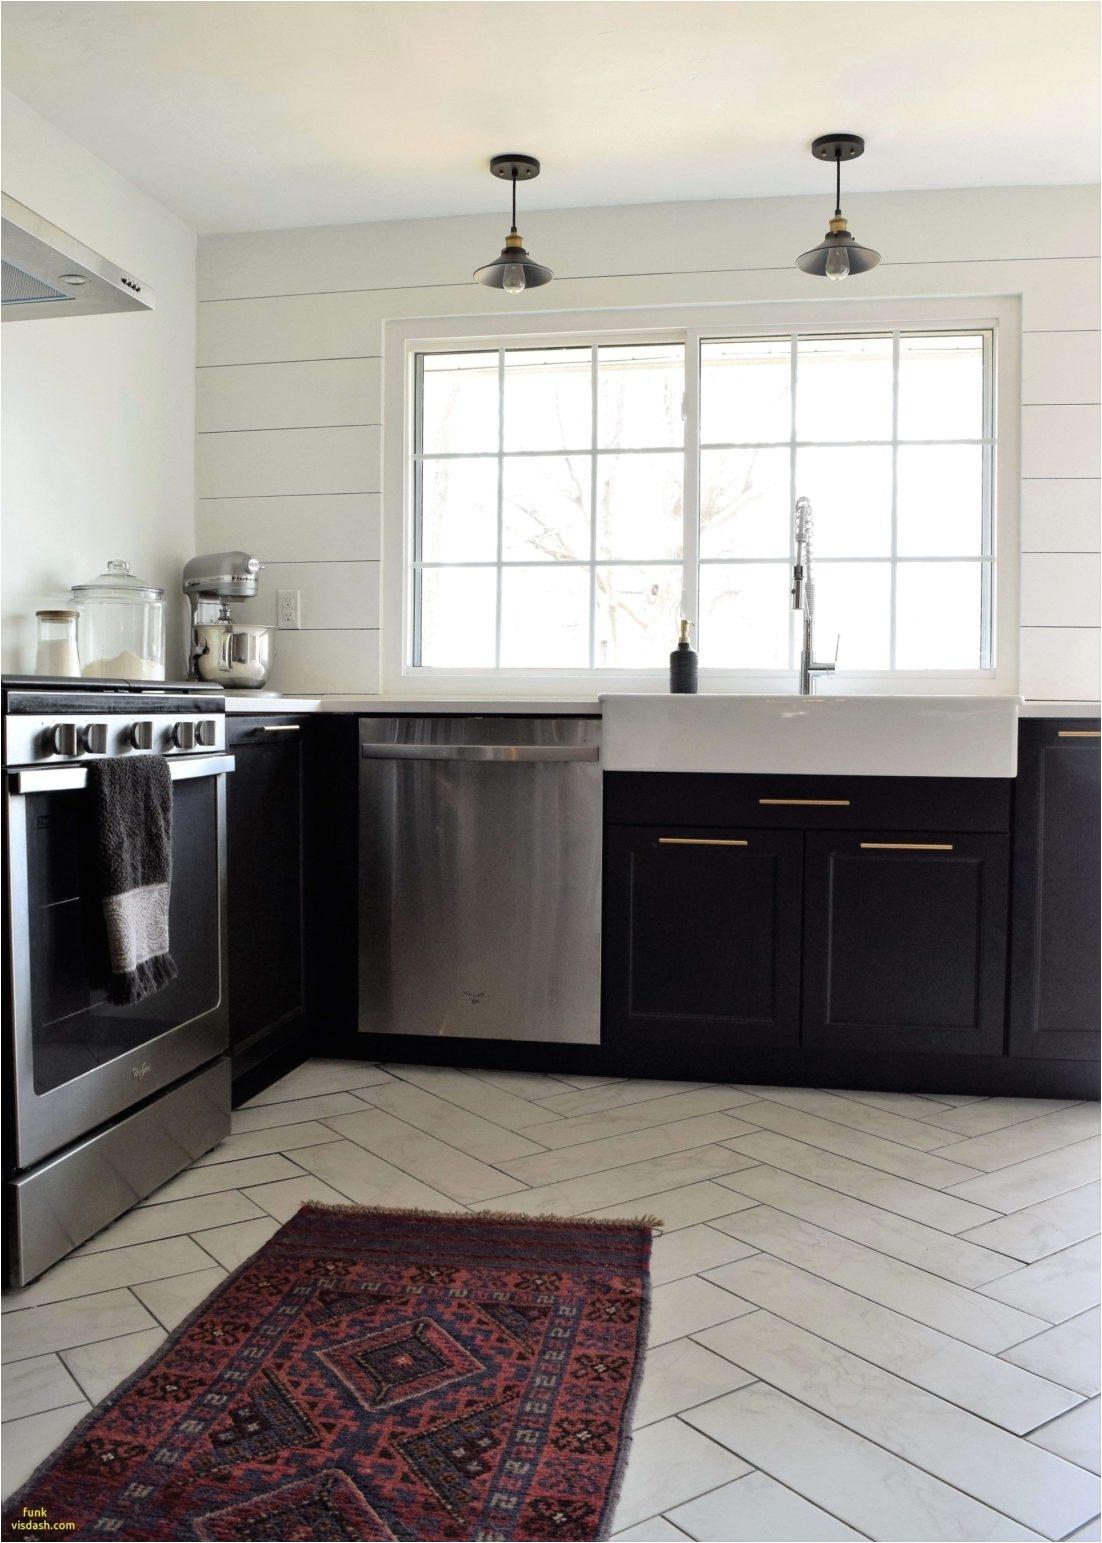 Kitchen Tile Ideas Kitchen Tile Ideas Beautiful Stunning Tile Kitchen In Kitchen Design 0d Design Kitchen